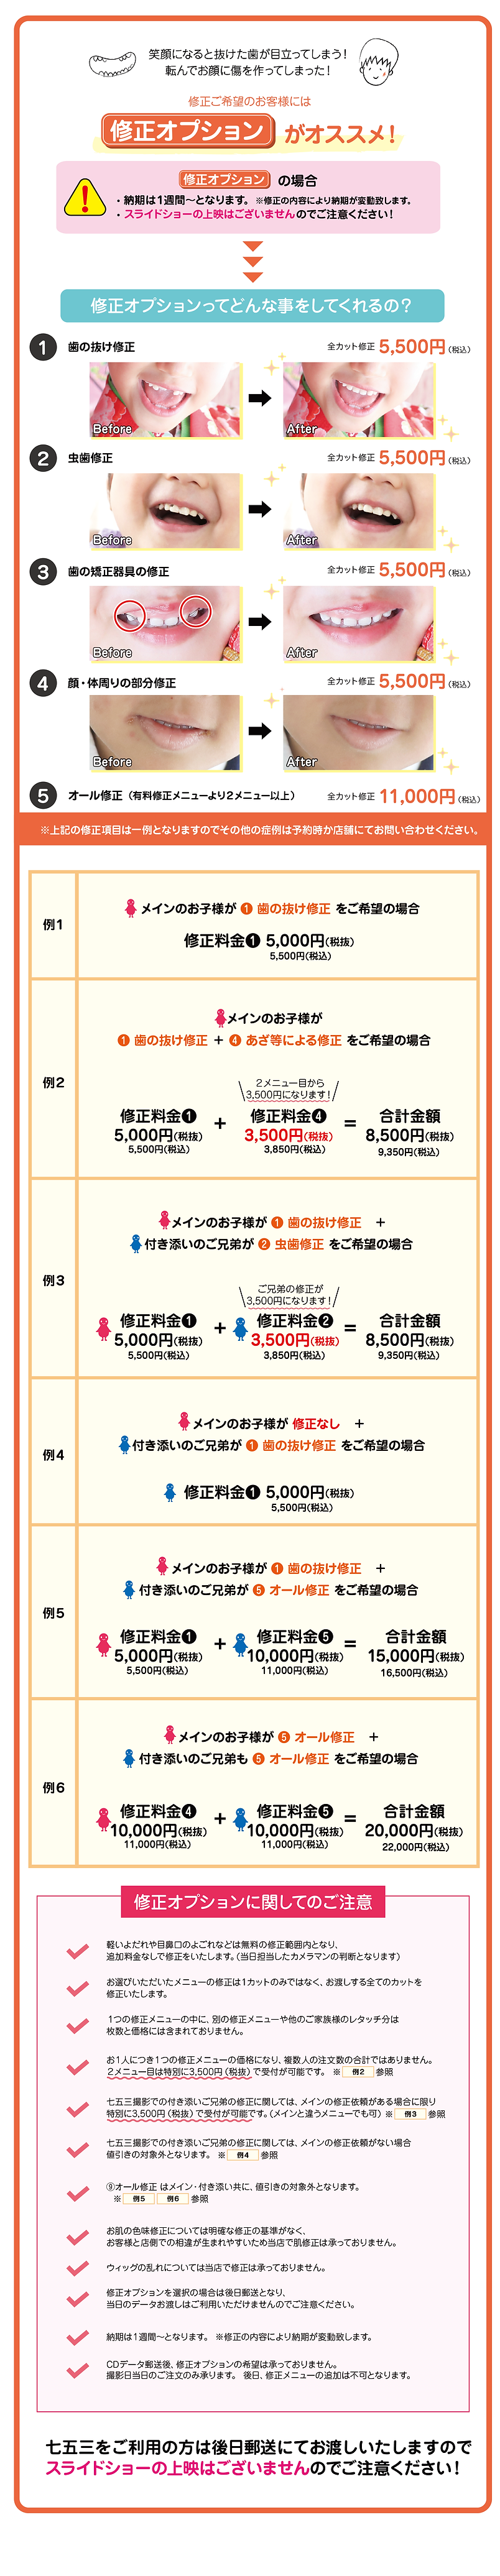 202103_data_toujitsu_page.png